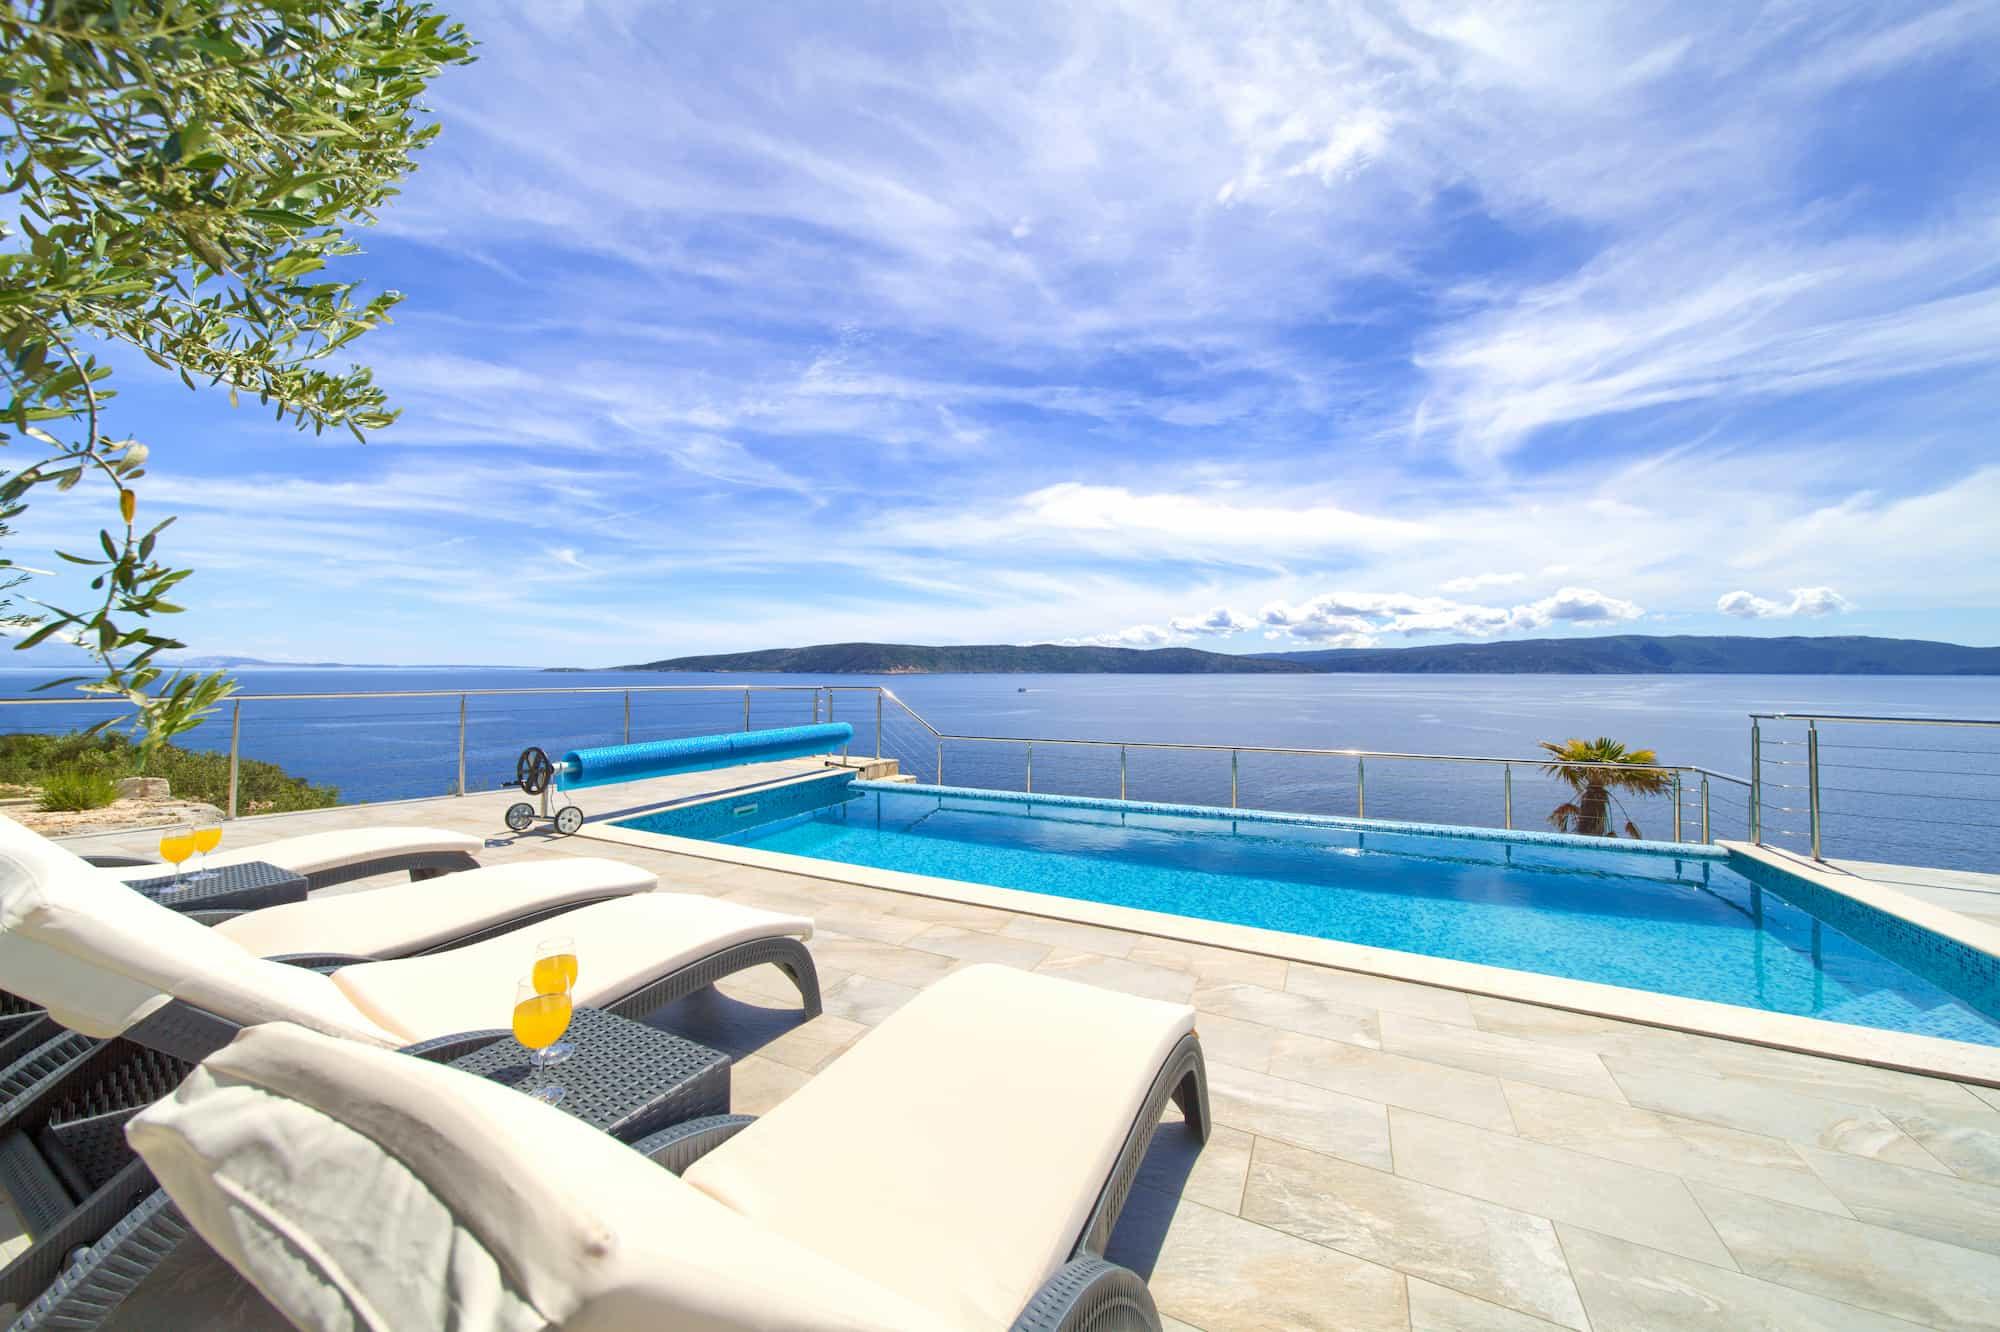 Villa mit Pool, 70 Meter vom Meer entfernt, Meerblick